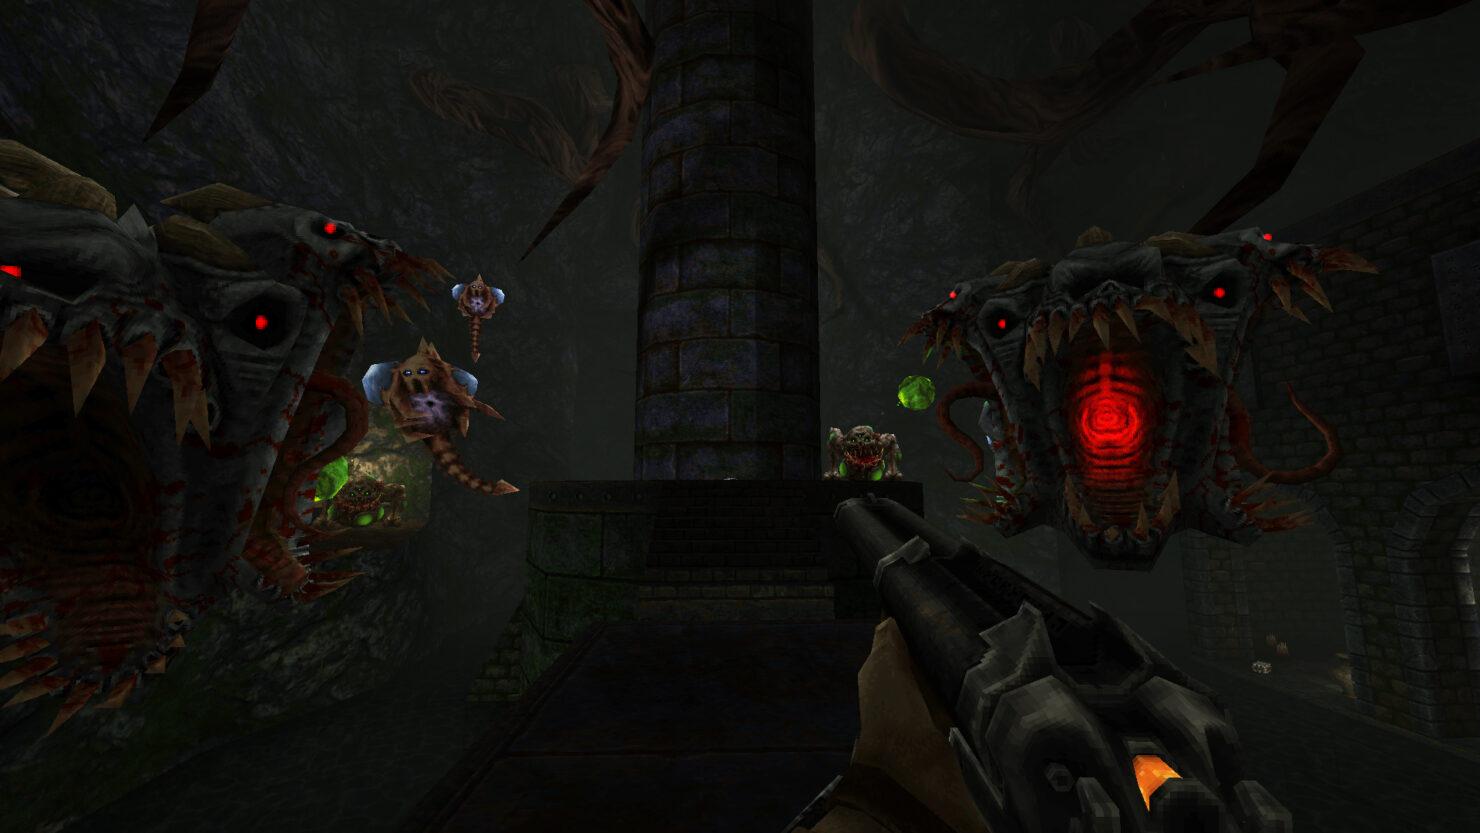 wrath-aeon-of-fury-early-access-launch-02-screenshot-15